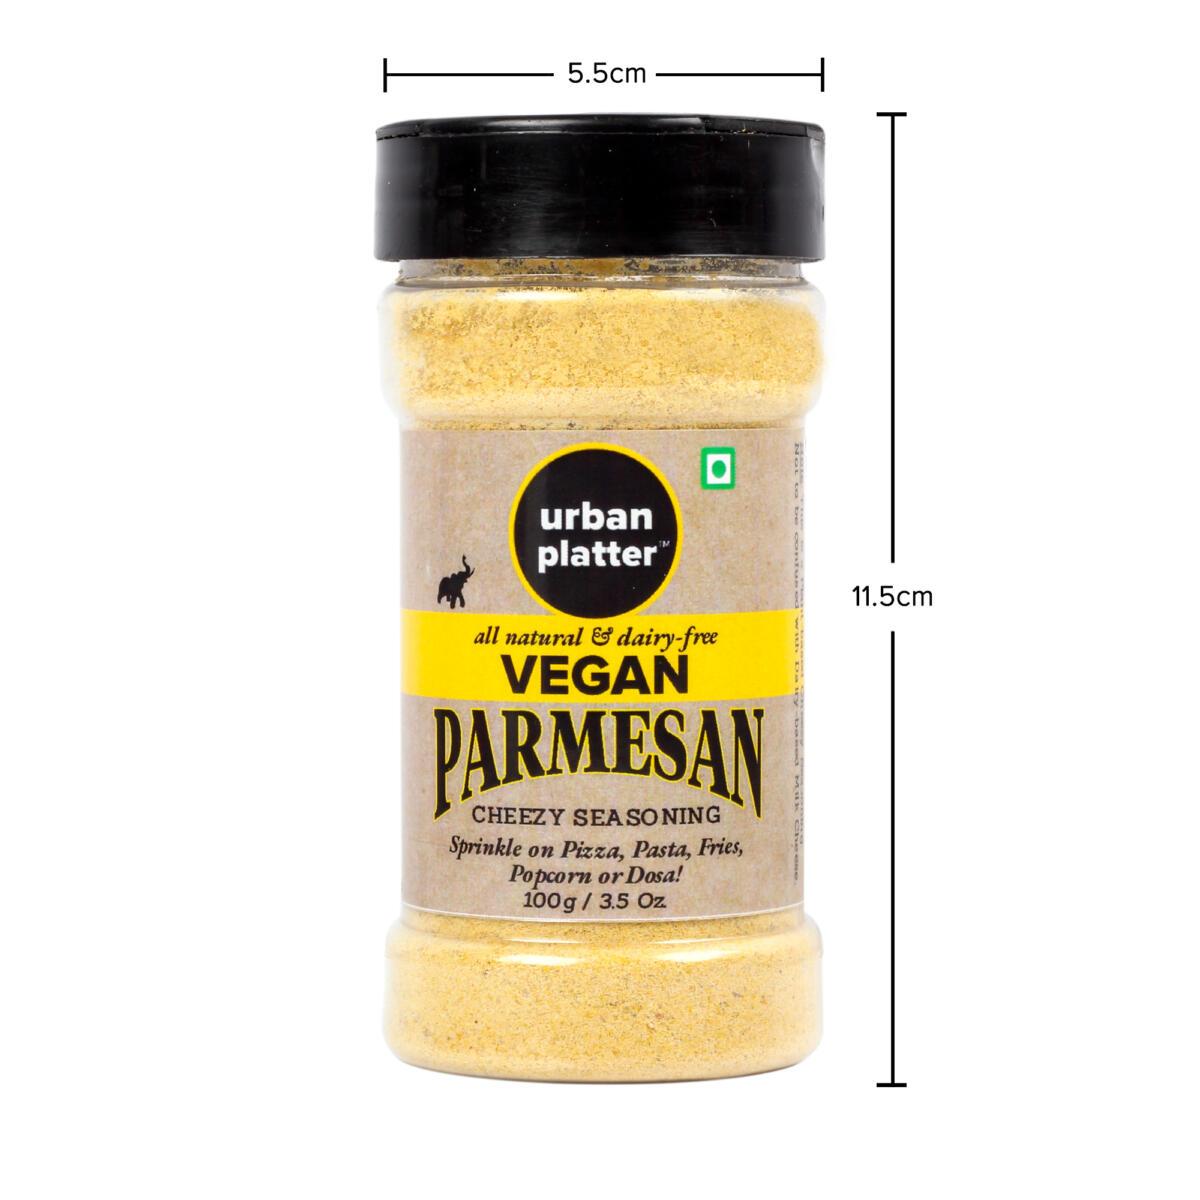 Urban Platter Vegan Parmesan Cheese Shaker Jar, 100g [Cheesy